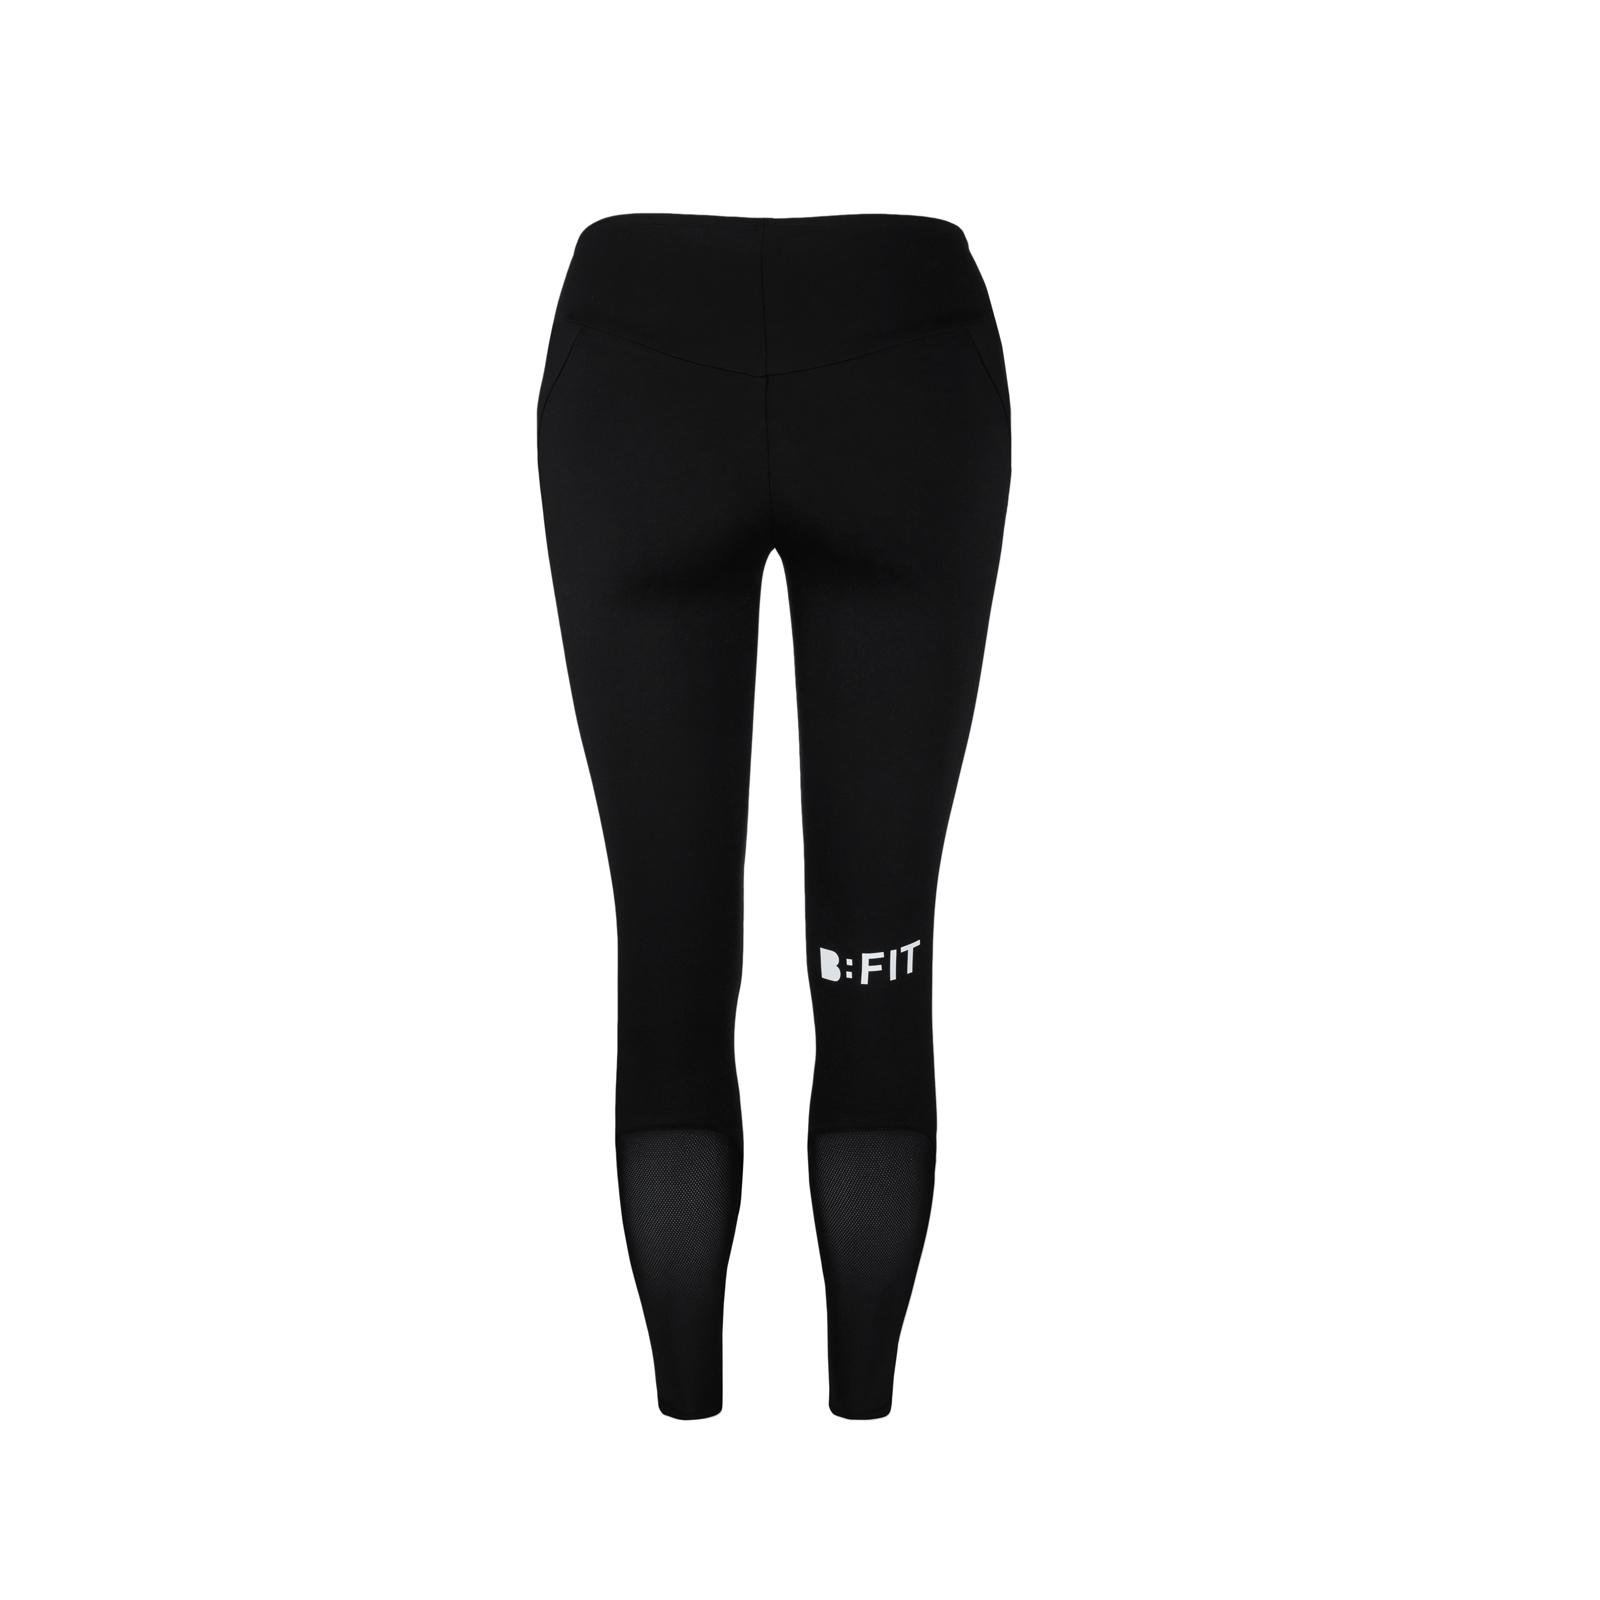 3eea359c8969b9 B:FIT legginsy NILIT® Innergy push-up czarne - B:FIT